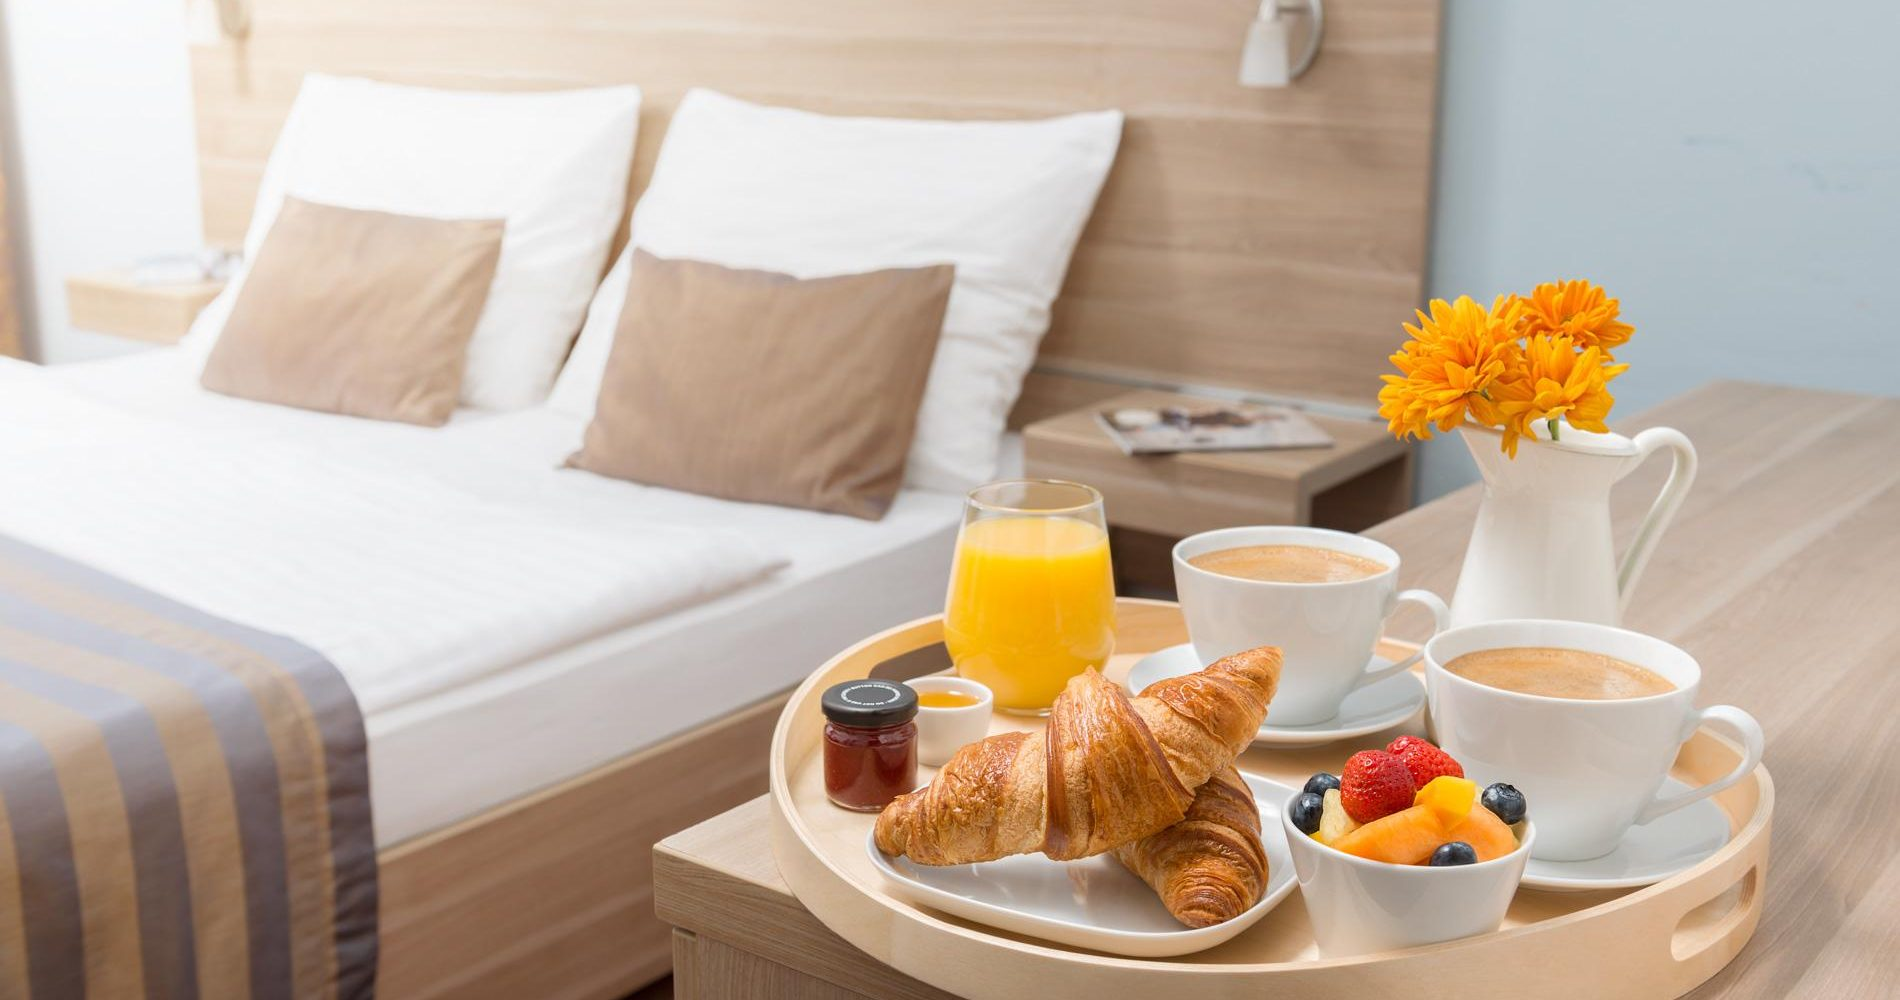 Hotel room serviced breakfast. In cozy hotel.